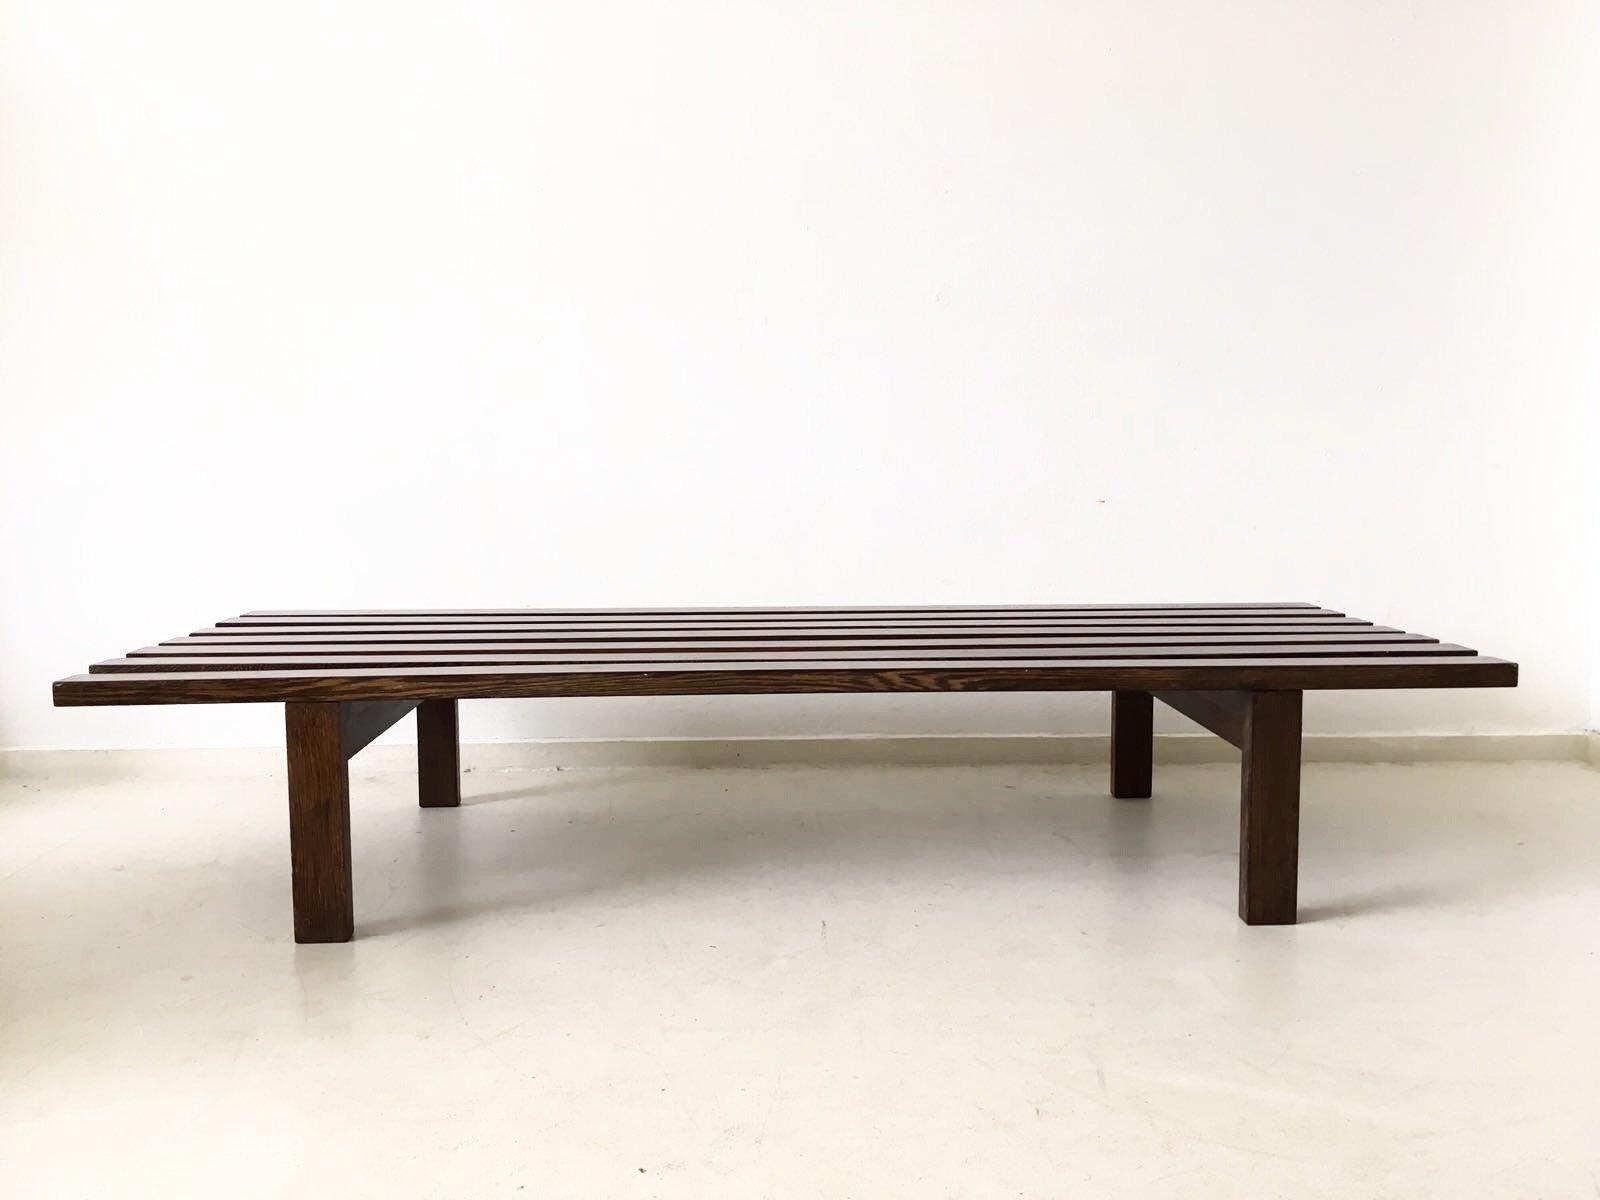 Slat Bench By Martin Visser For 39 T Spectrum Bergeijk 1965 For Sale At Pamono